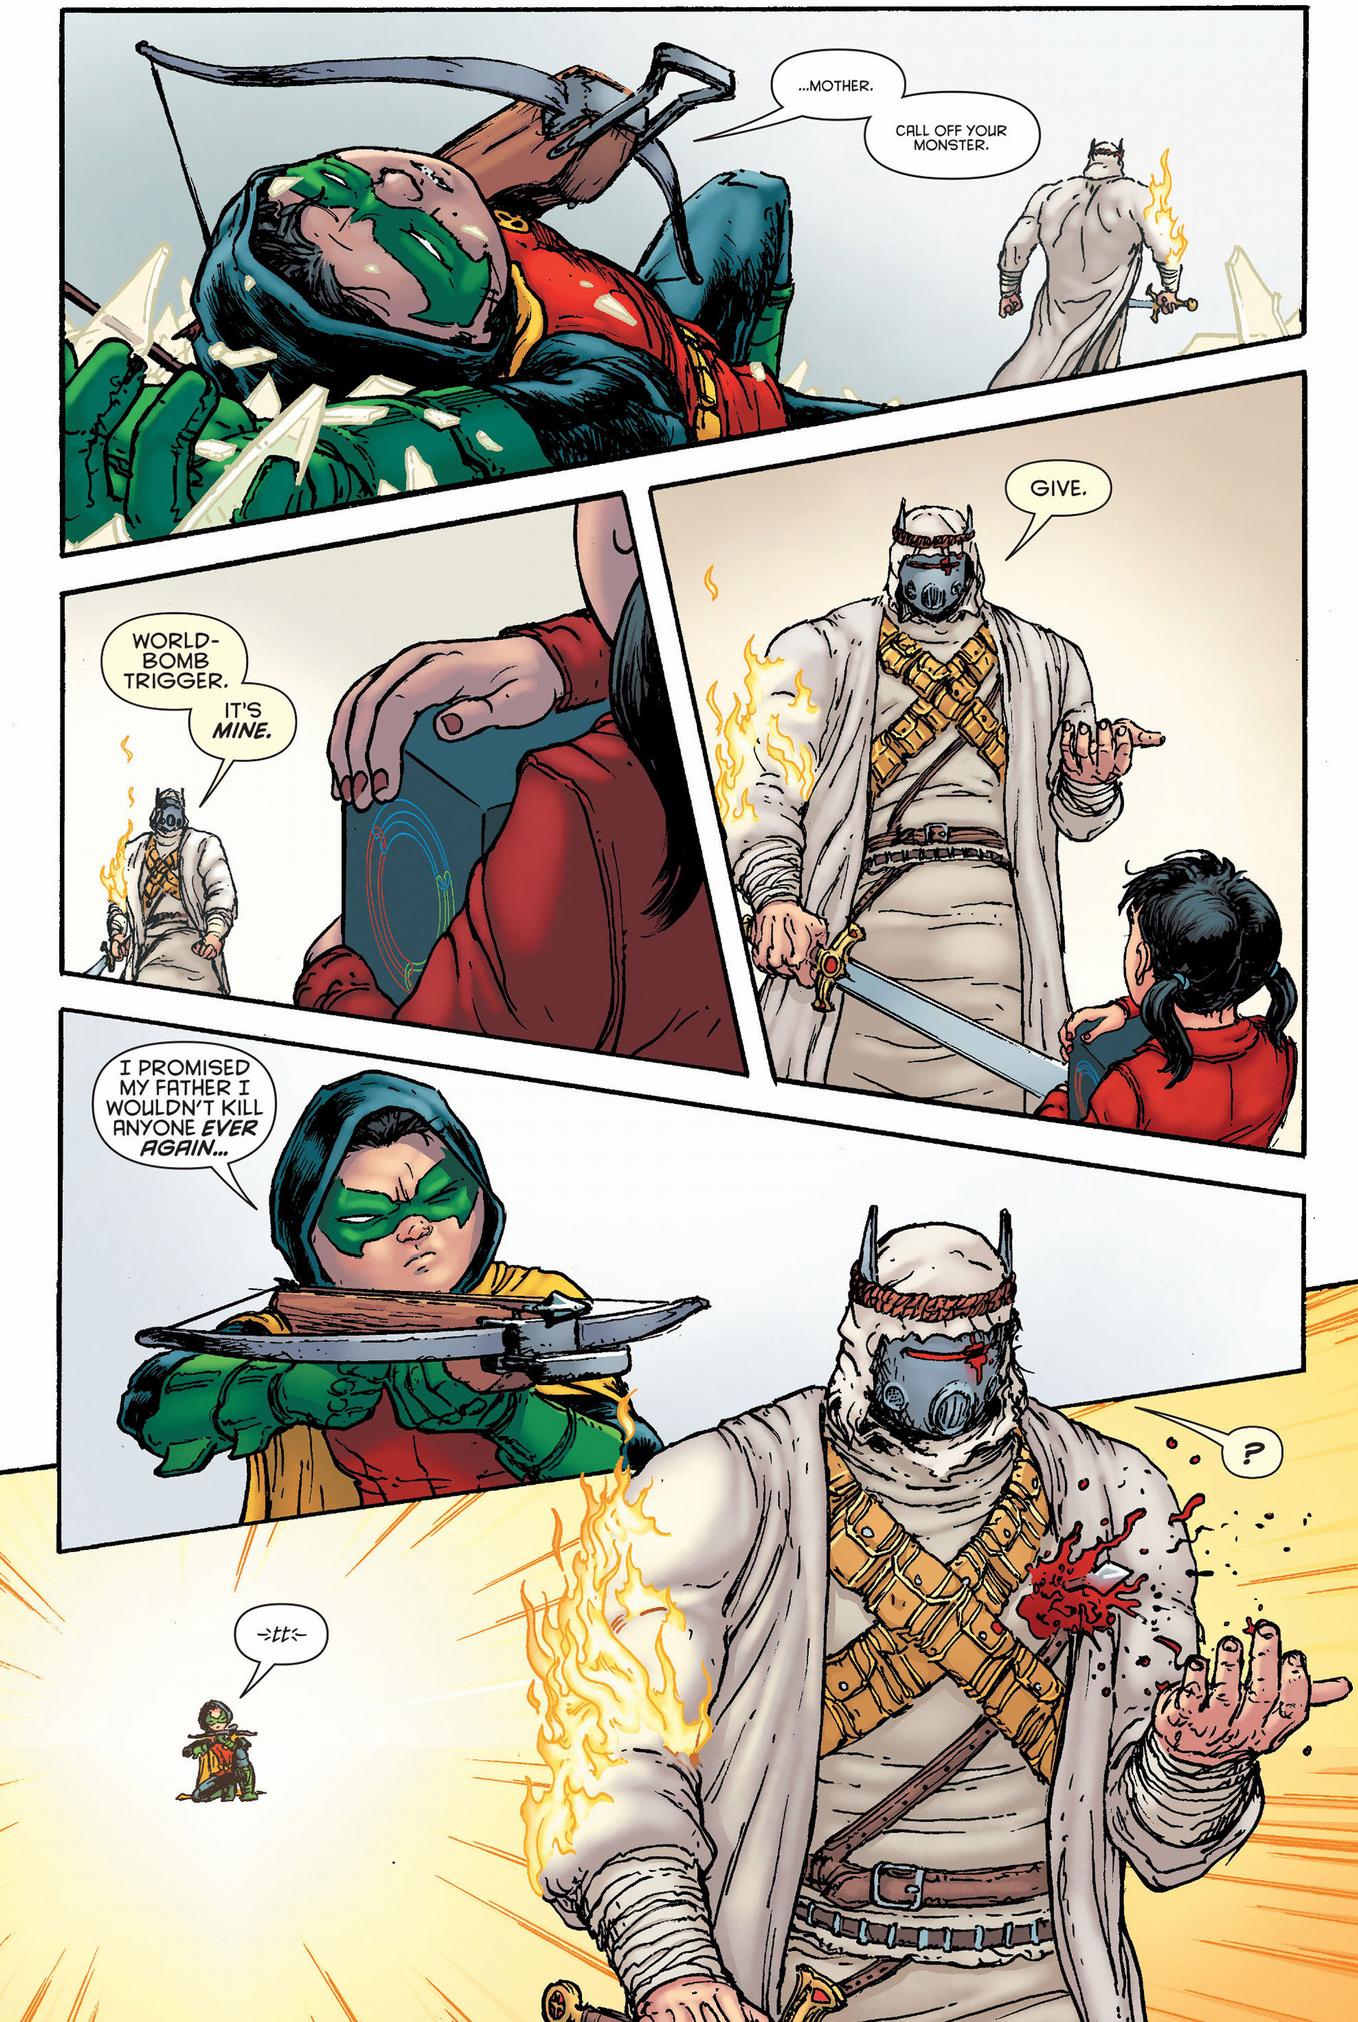 The Heretic Kills Robin (Damian Wayne)